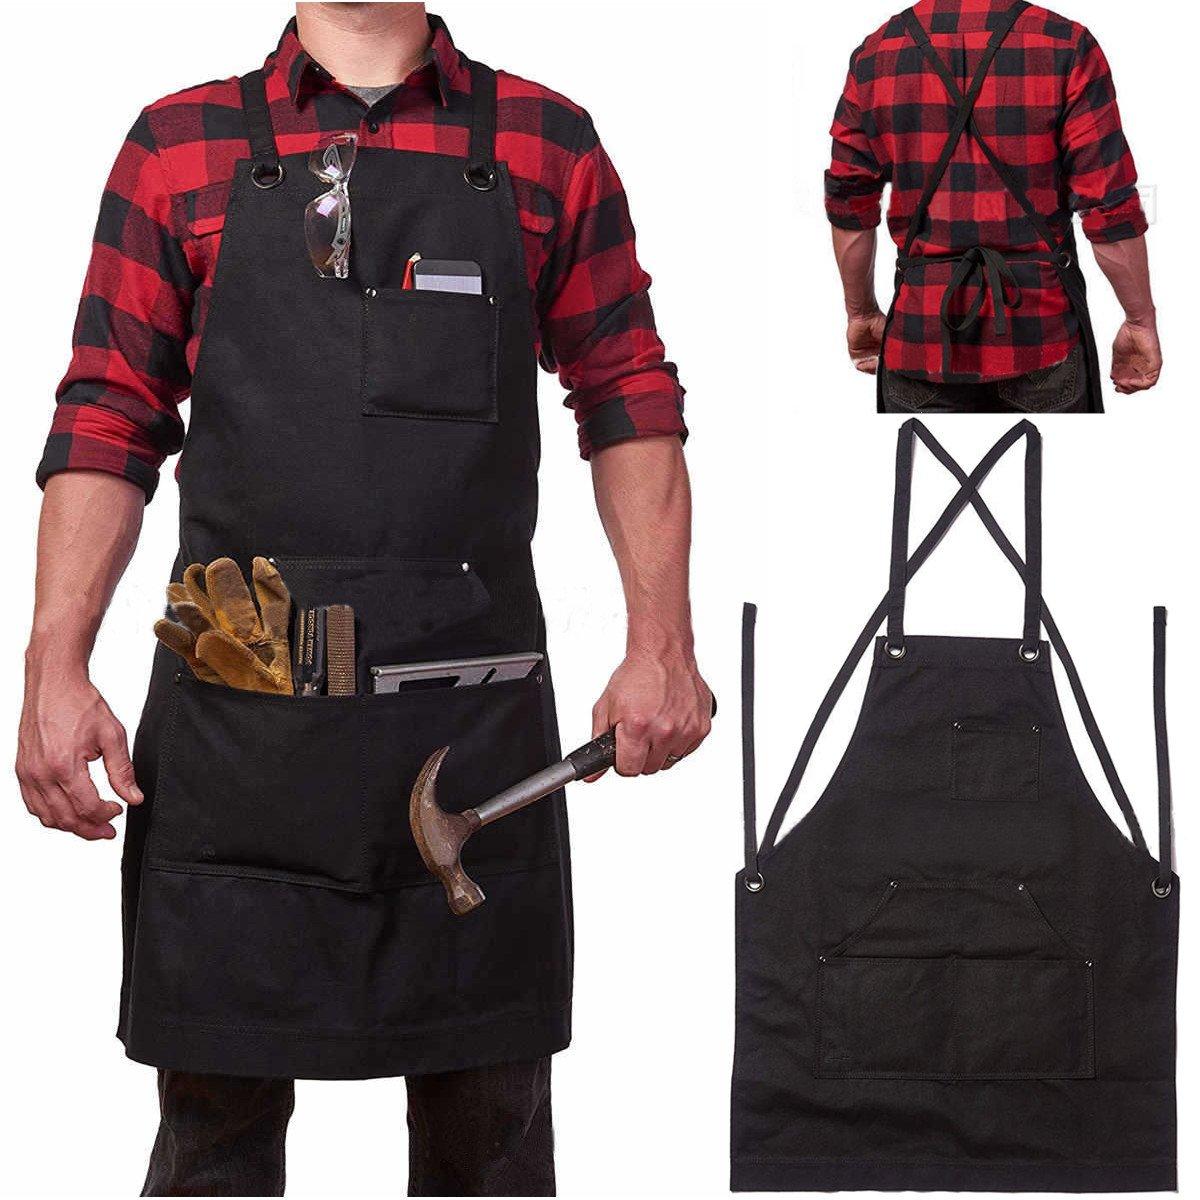 Tool Organizers Heavy Duty Waxed Canvas Work Hobby Apron Large Pocket Fits Small to XXL Black